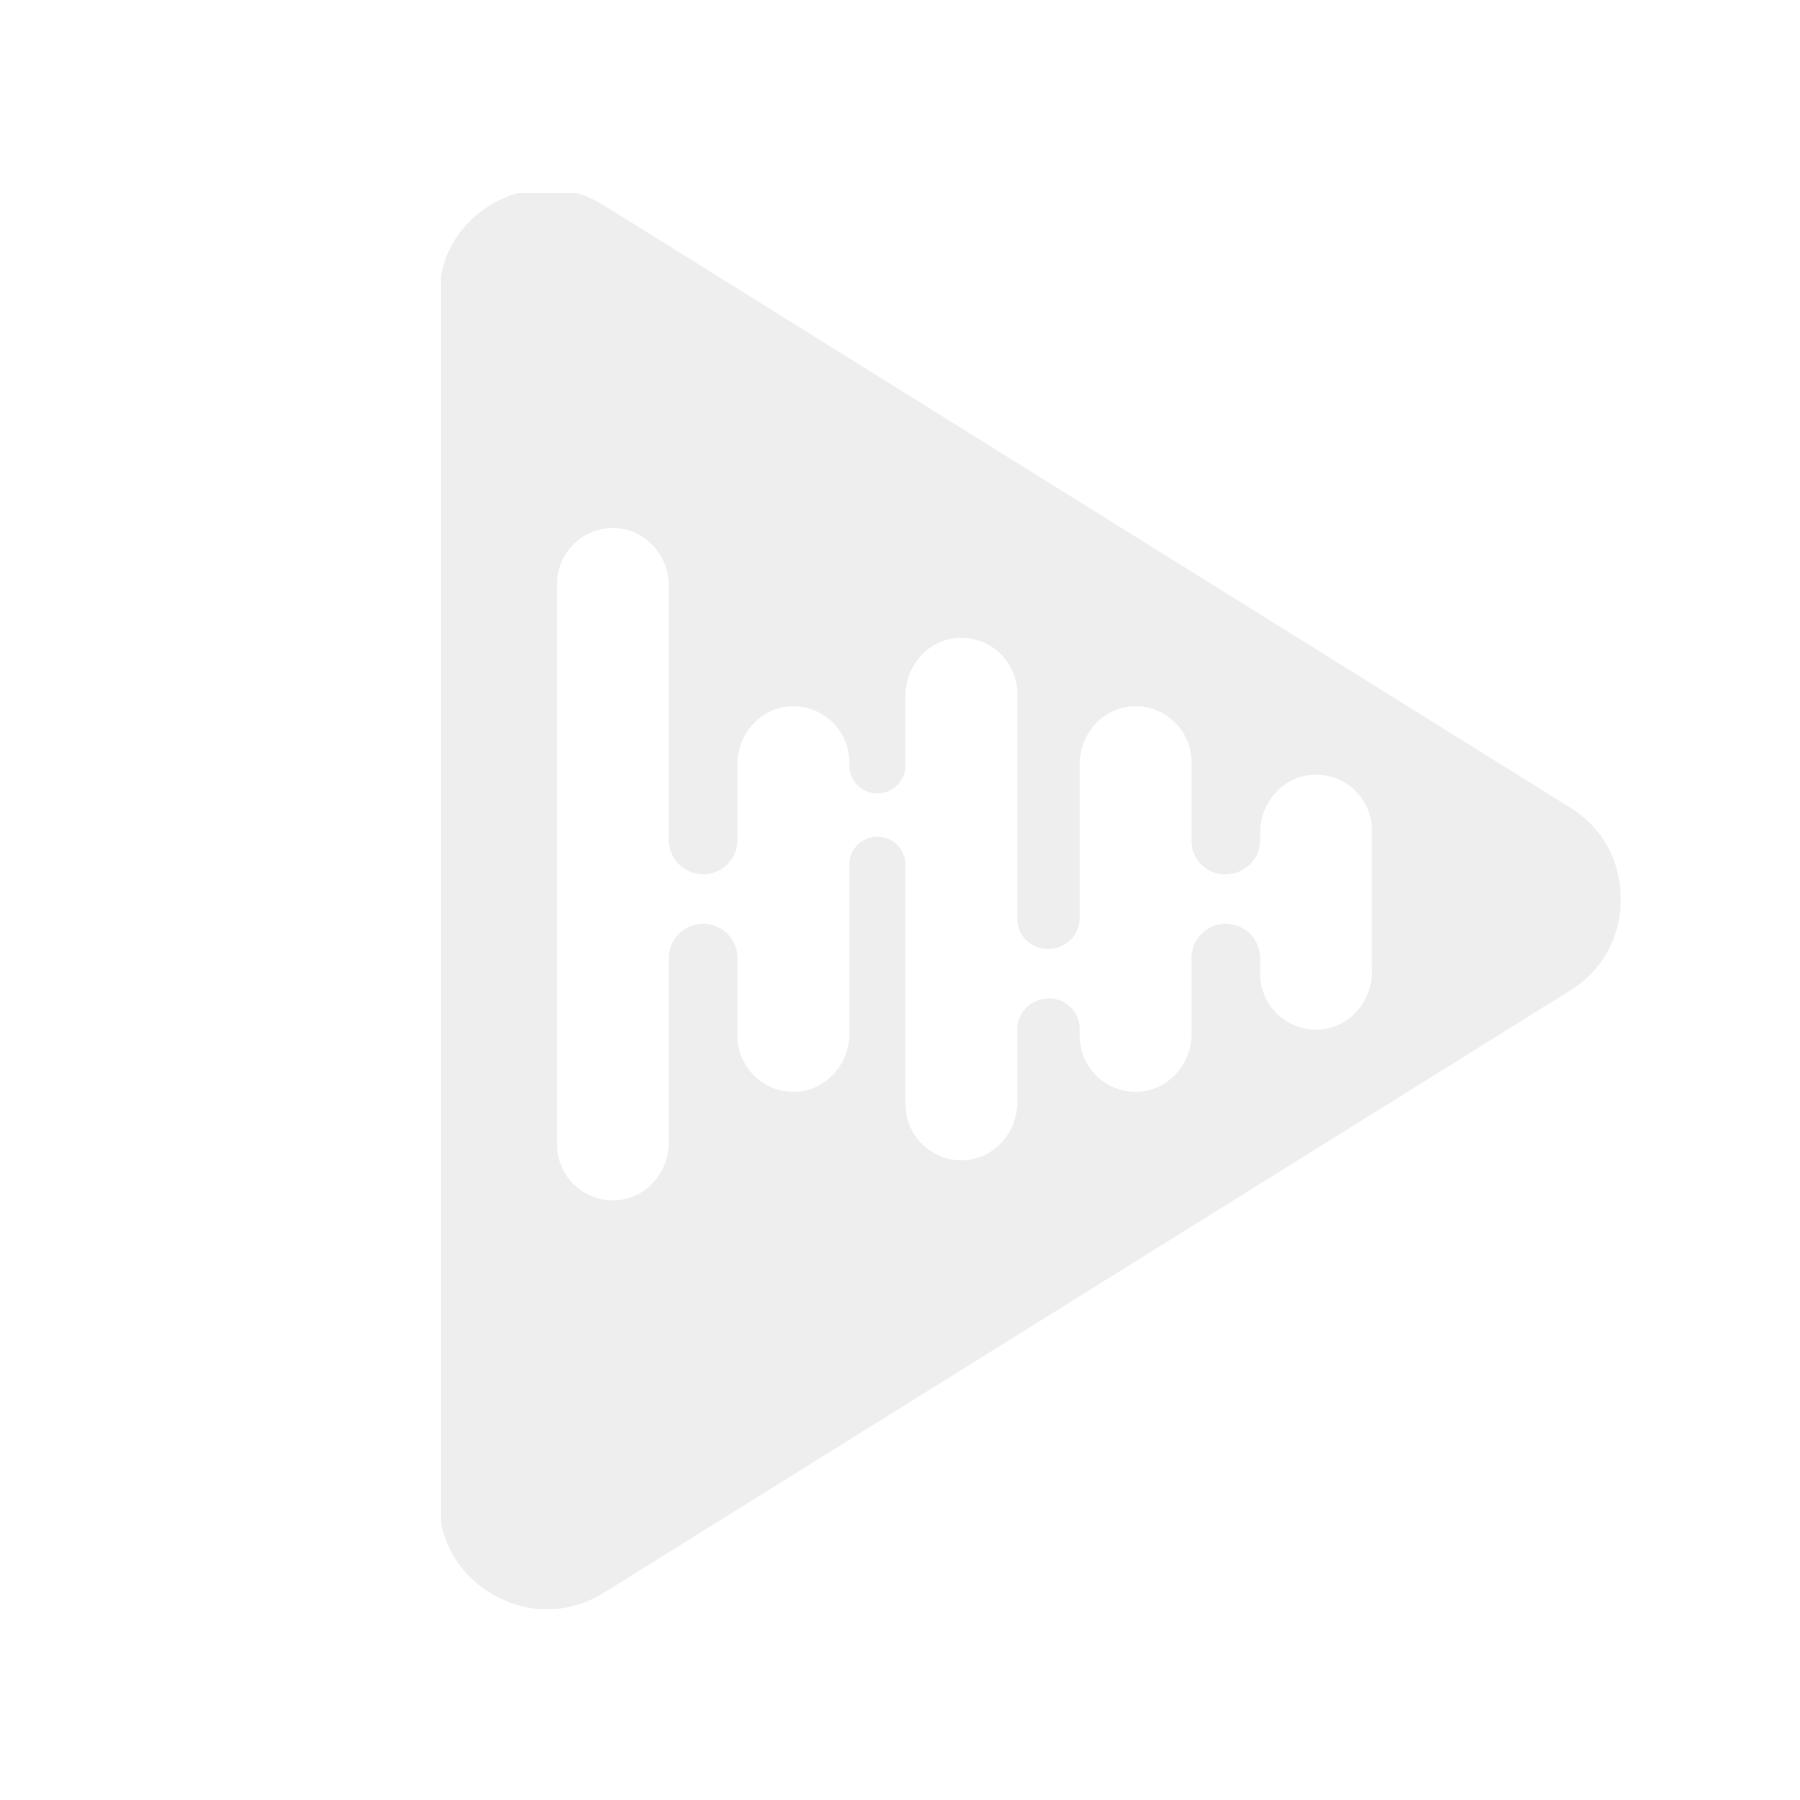 Eton UG OPEL RX2.1